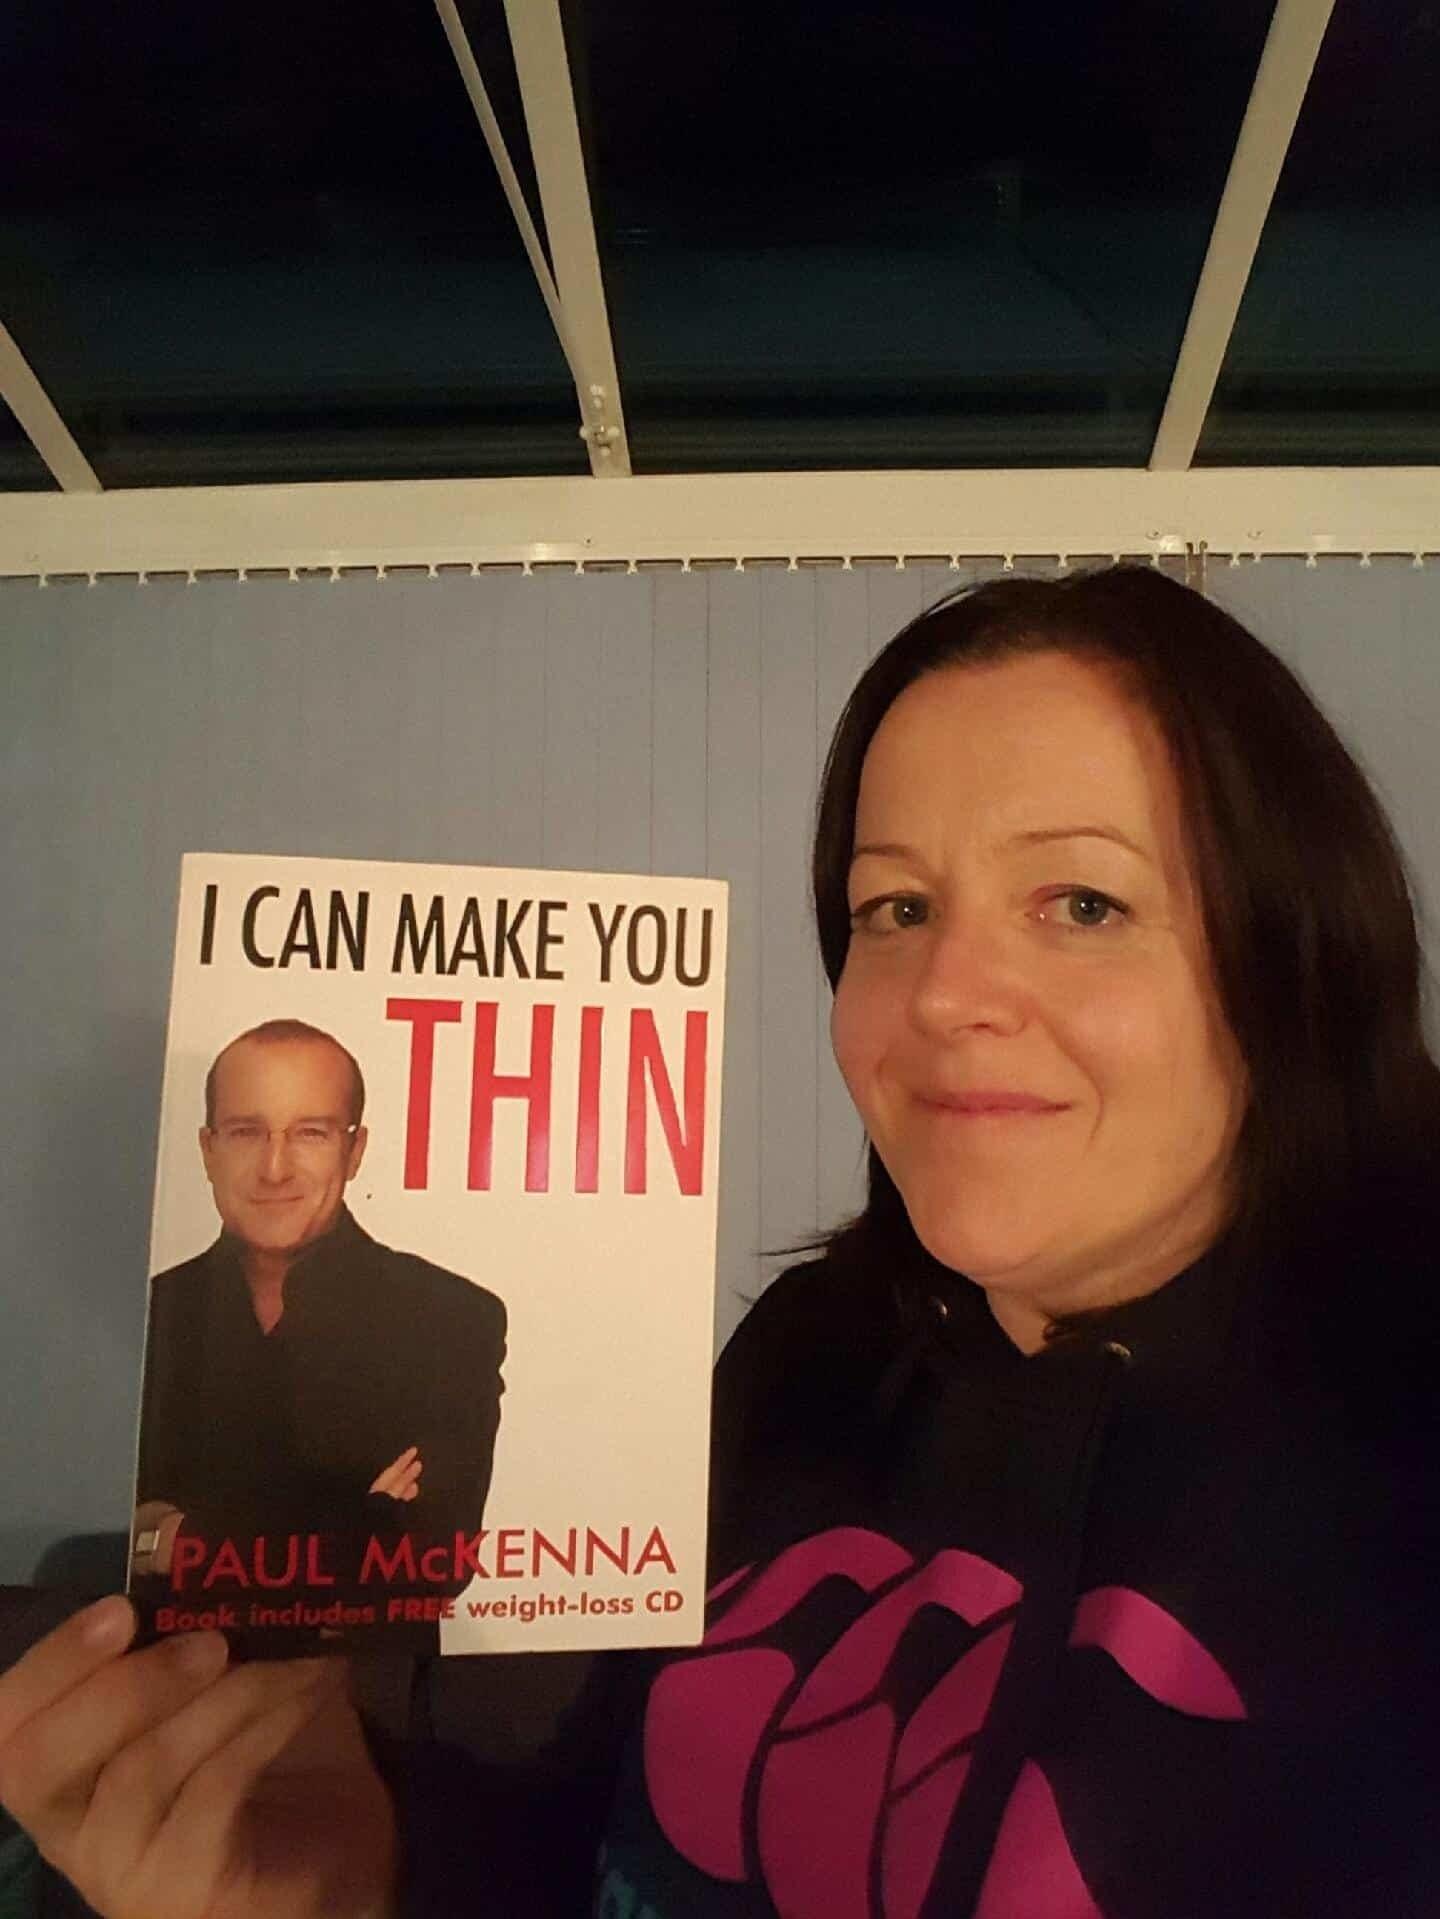 Paul McKenna I can make you thin